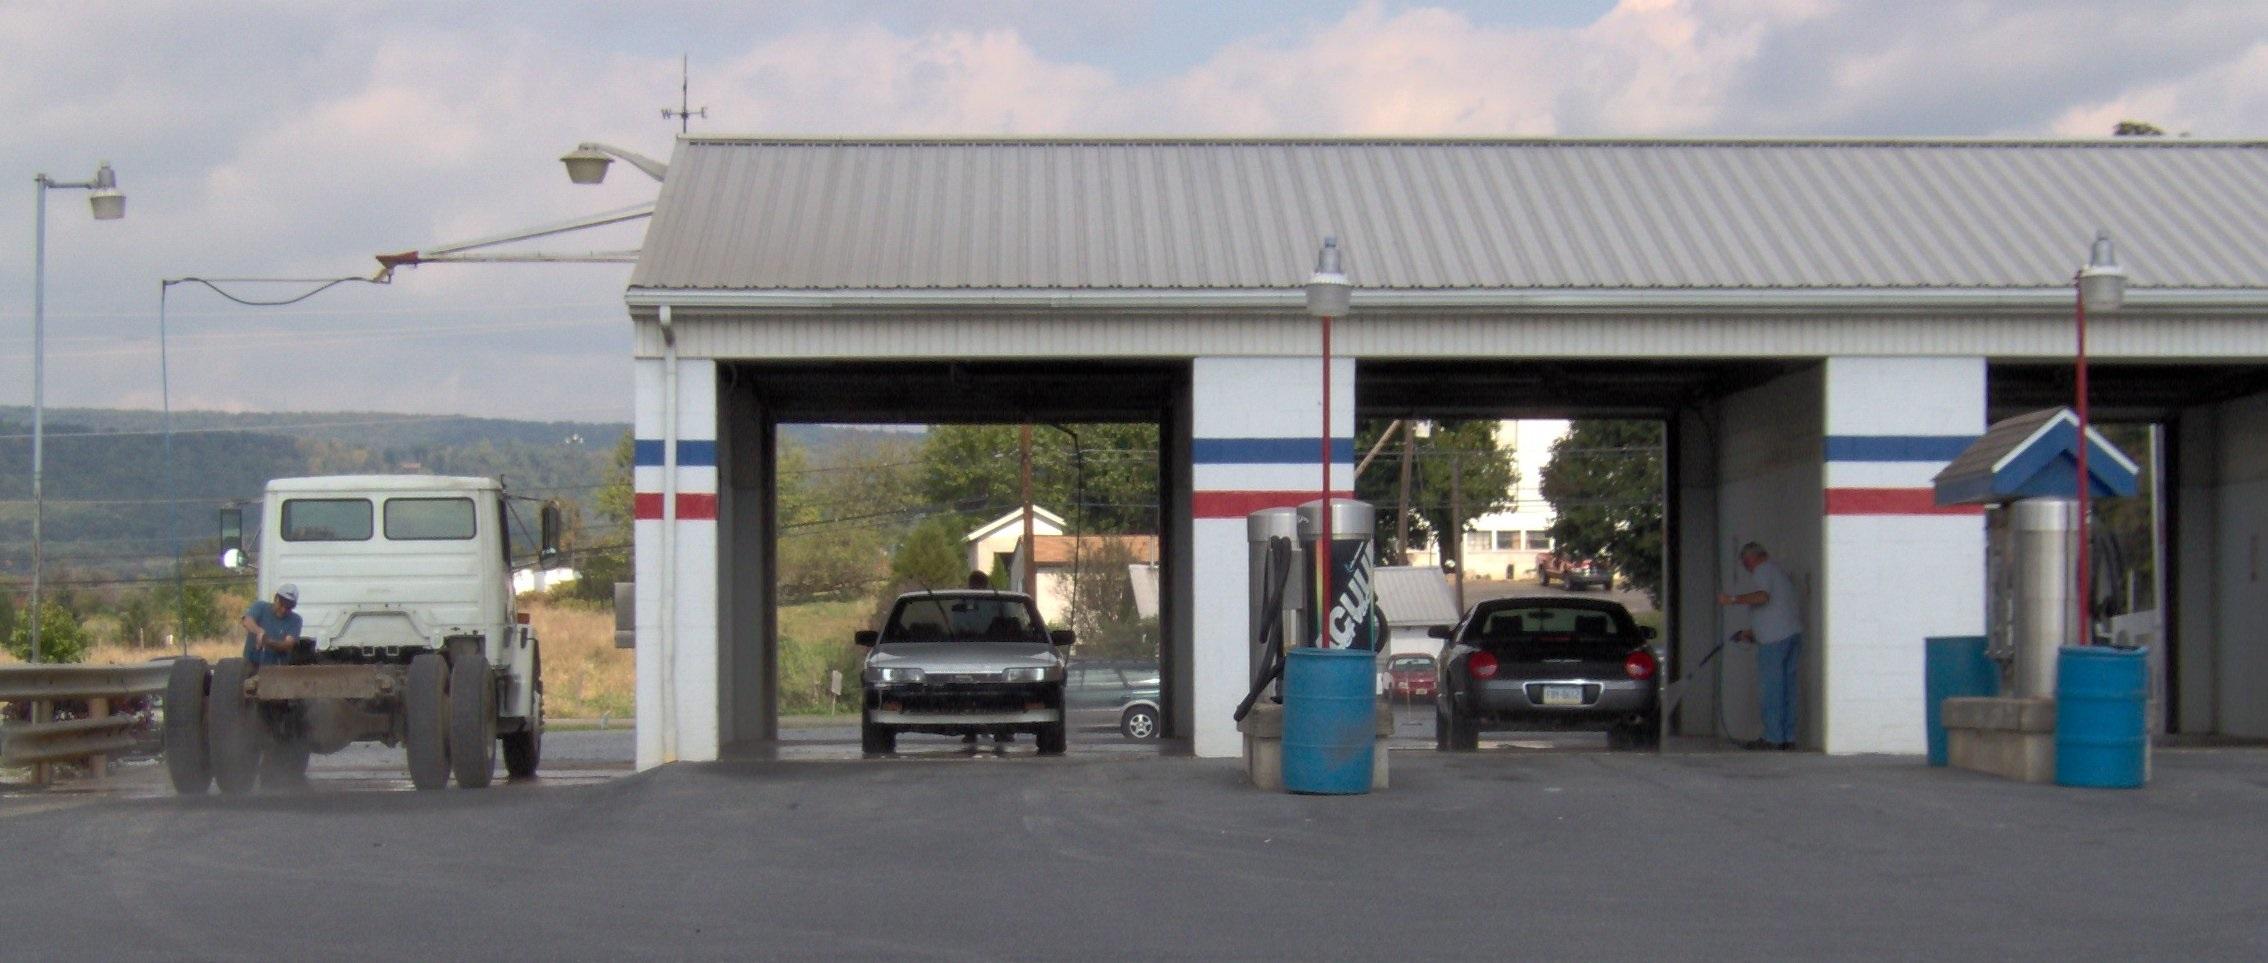 Car And Truck Wash Open 24 Hours D E Richard Garage Inc In Fredericksburg Pa 17026